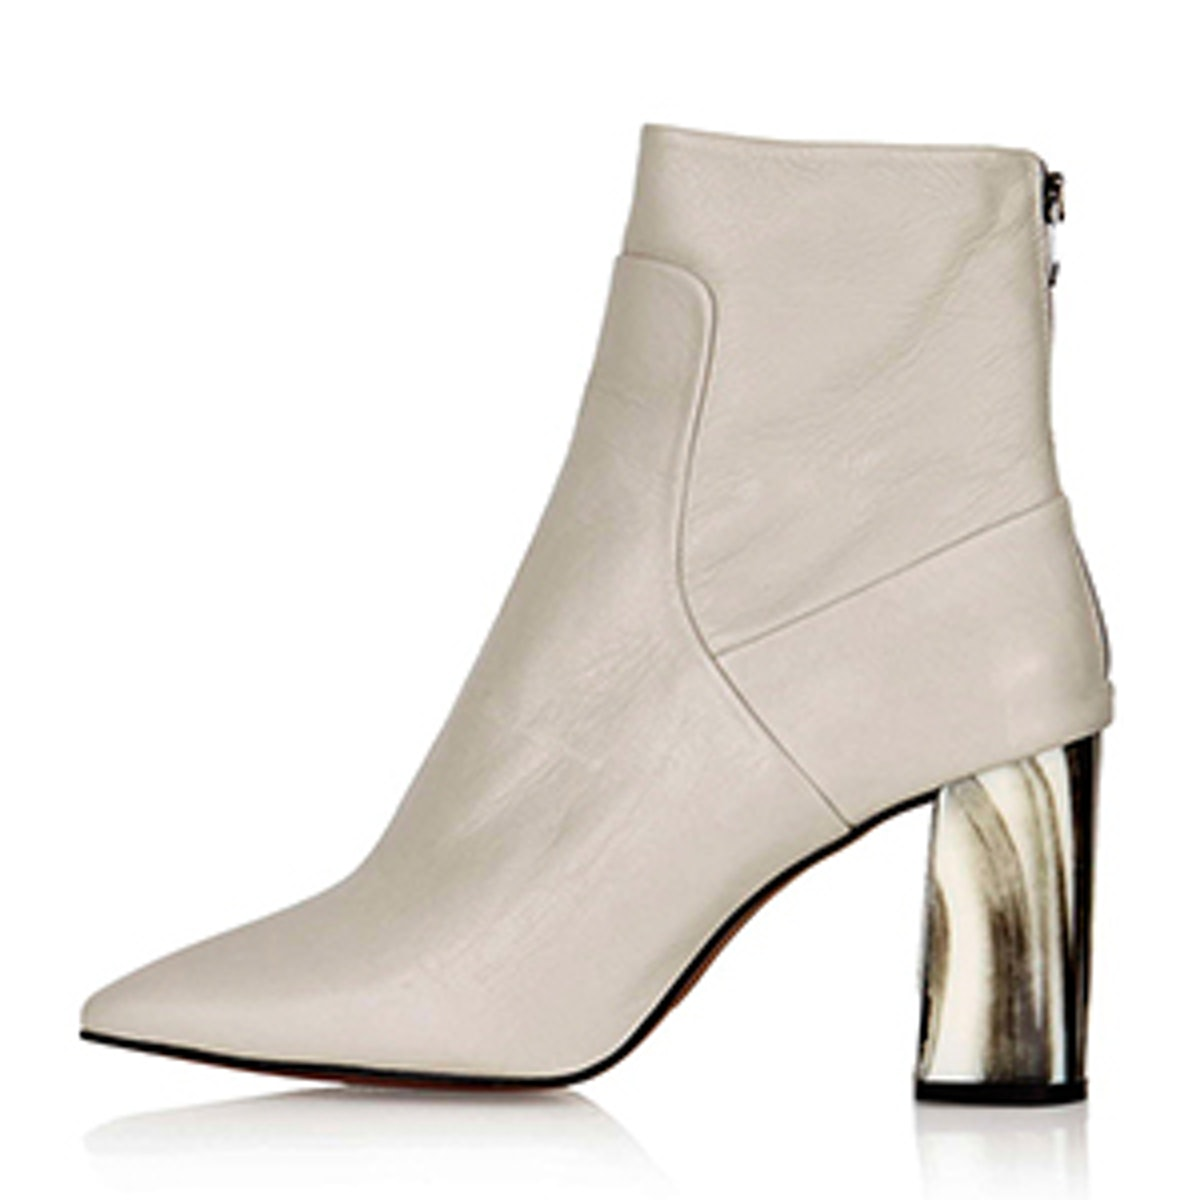 MUSE Bone Heel Boots